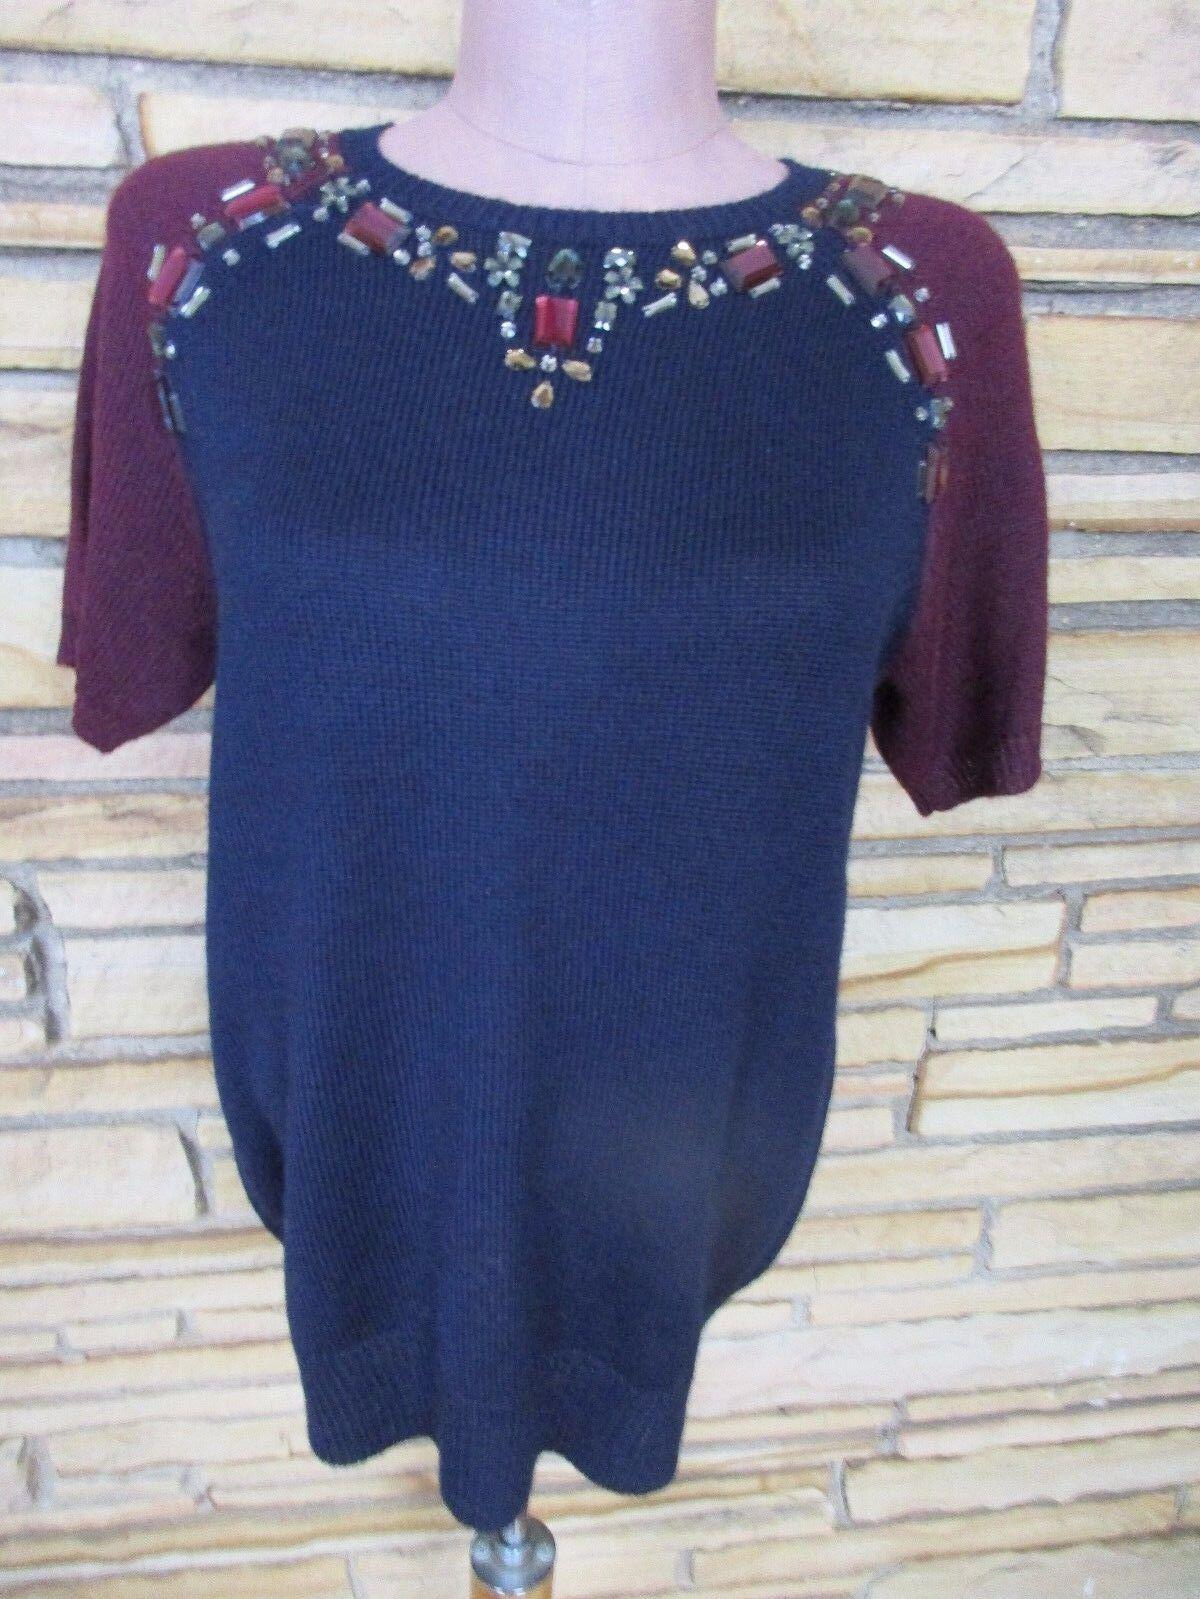 NWT J Crew Sz S M Short Sleeve Knit Sweater Top Beaded Navy Burgundy